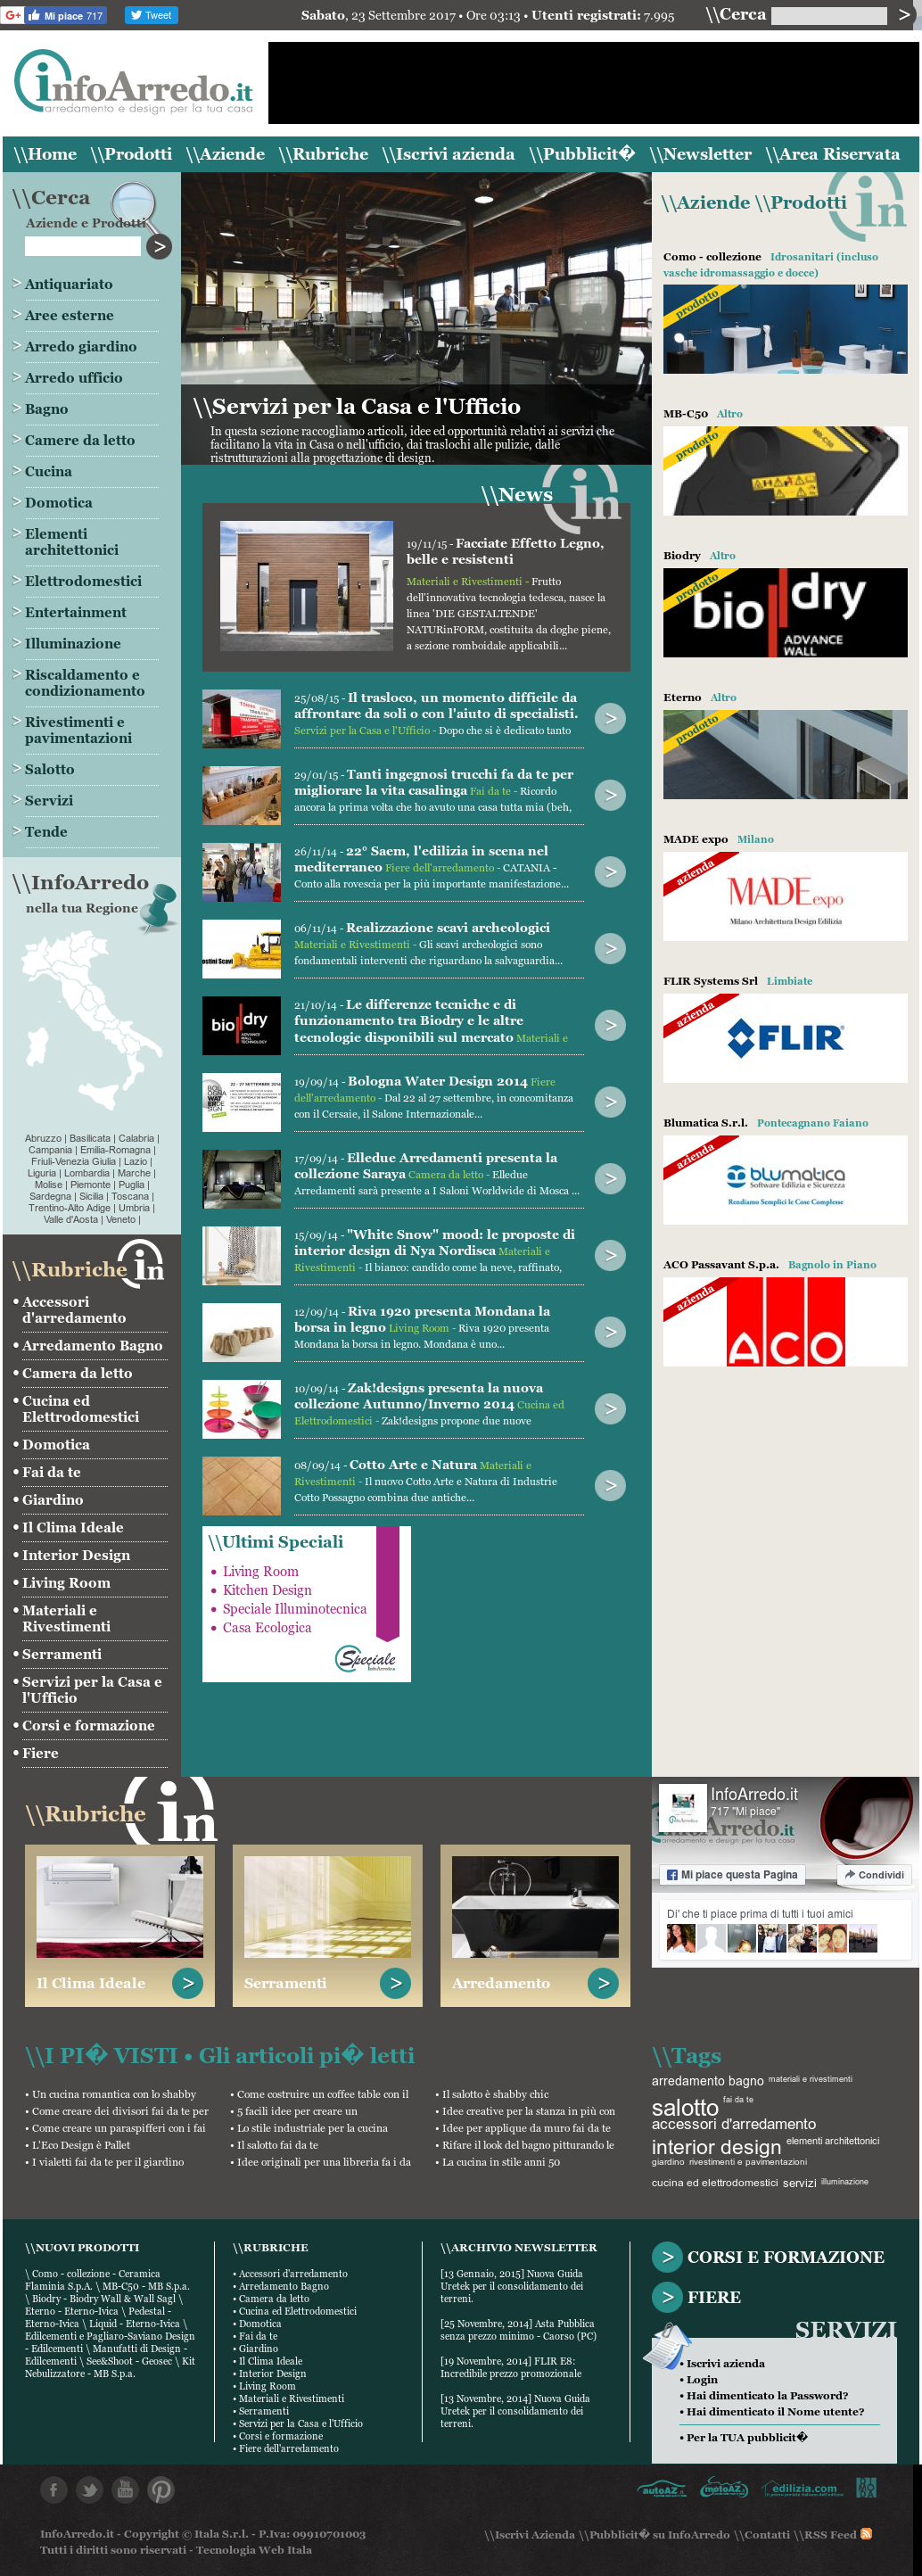 Cucina Pallet Fai Da Te infoarredo.it competitors, revenue and employees - owler